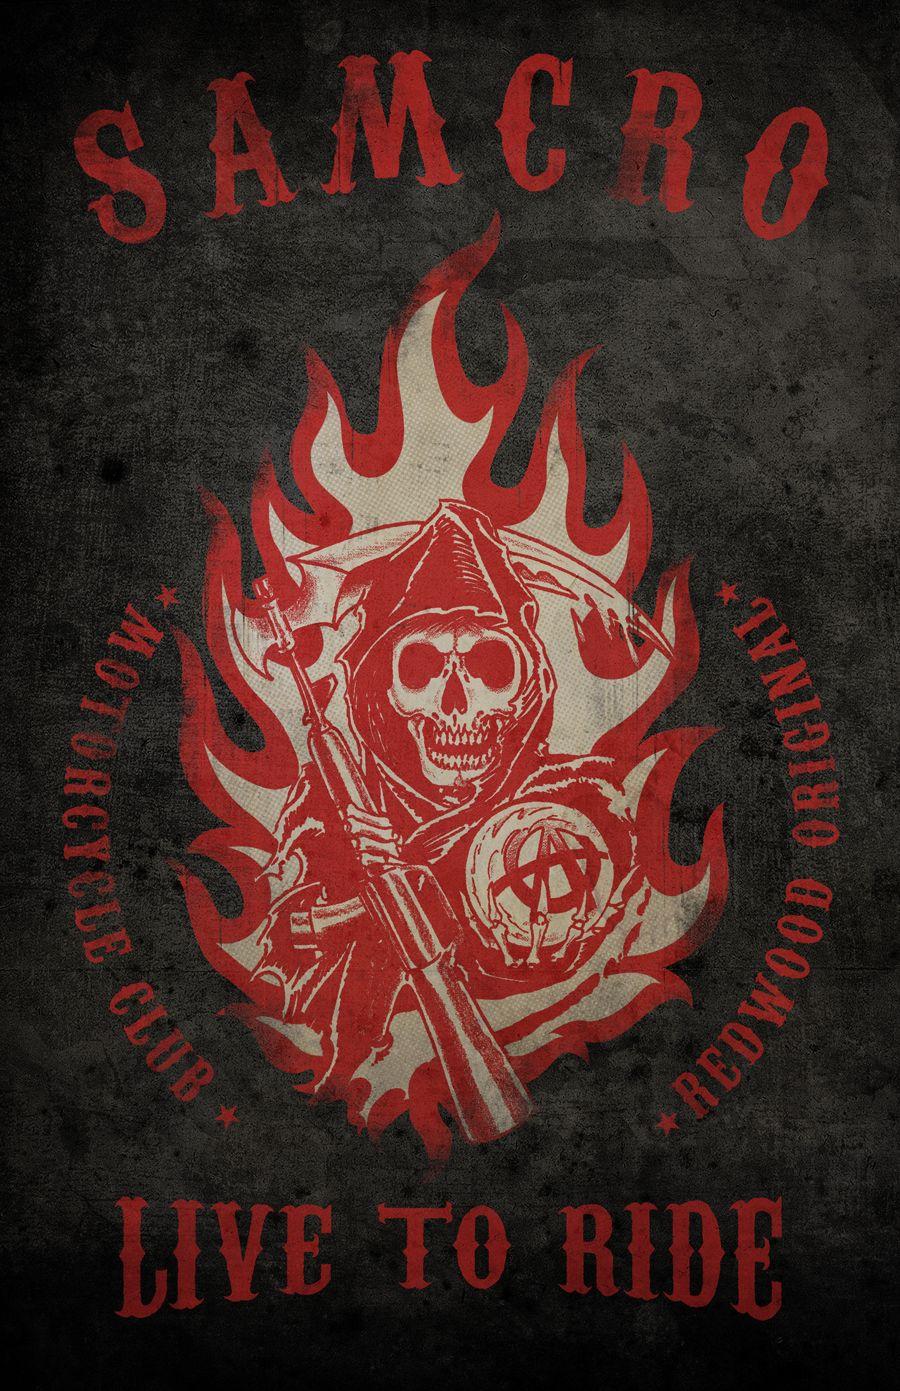 Sons Of Anarchy Calendar My Calendar Template Collection Sons Of Anarchy Sons Of Anarchy Mc Sons Of Anarchy Samcro